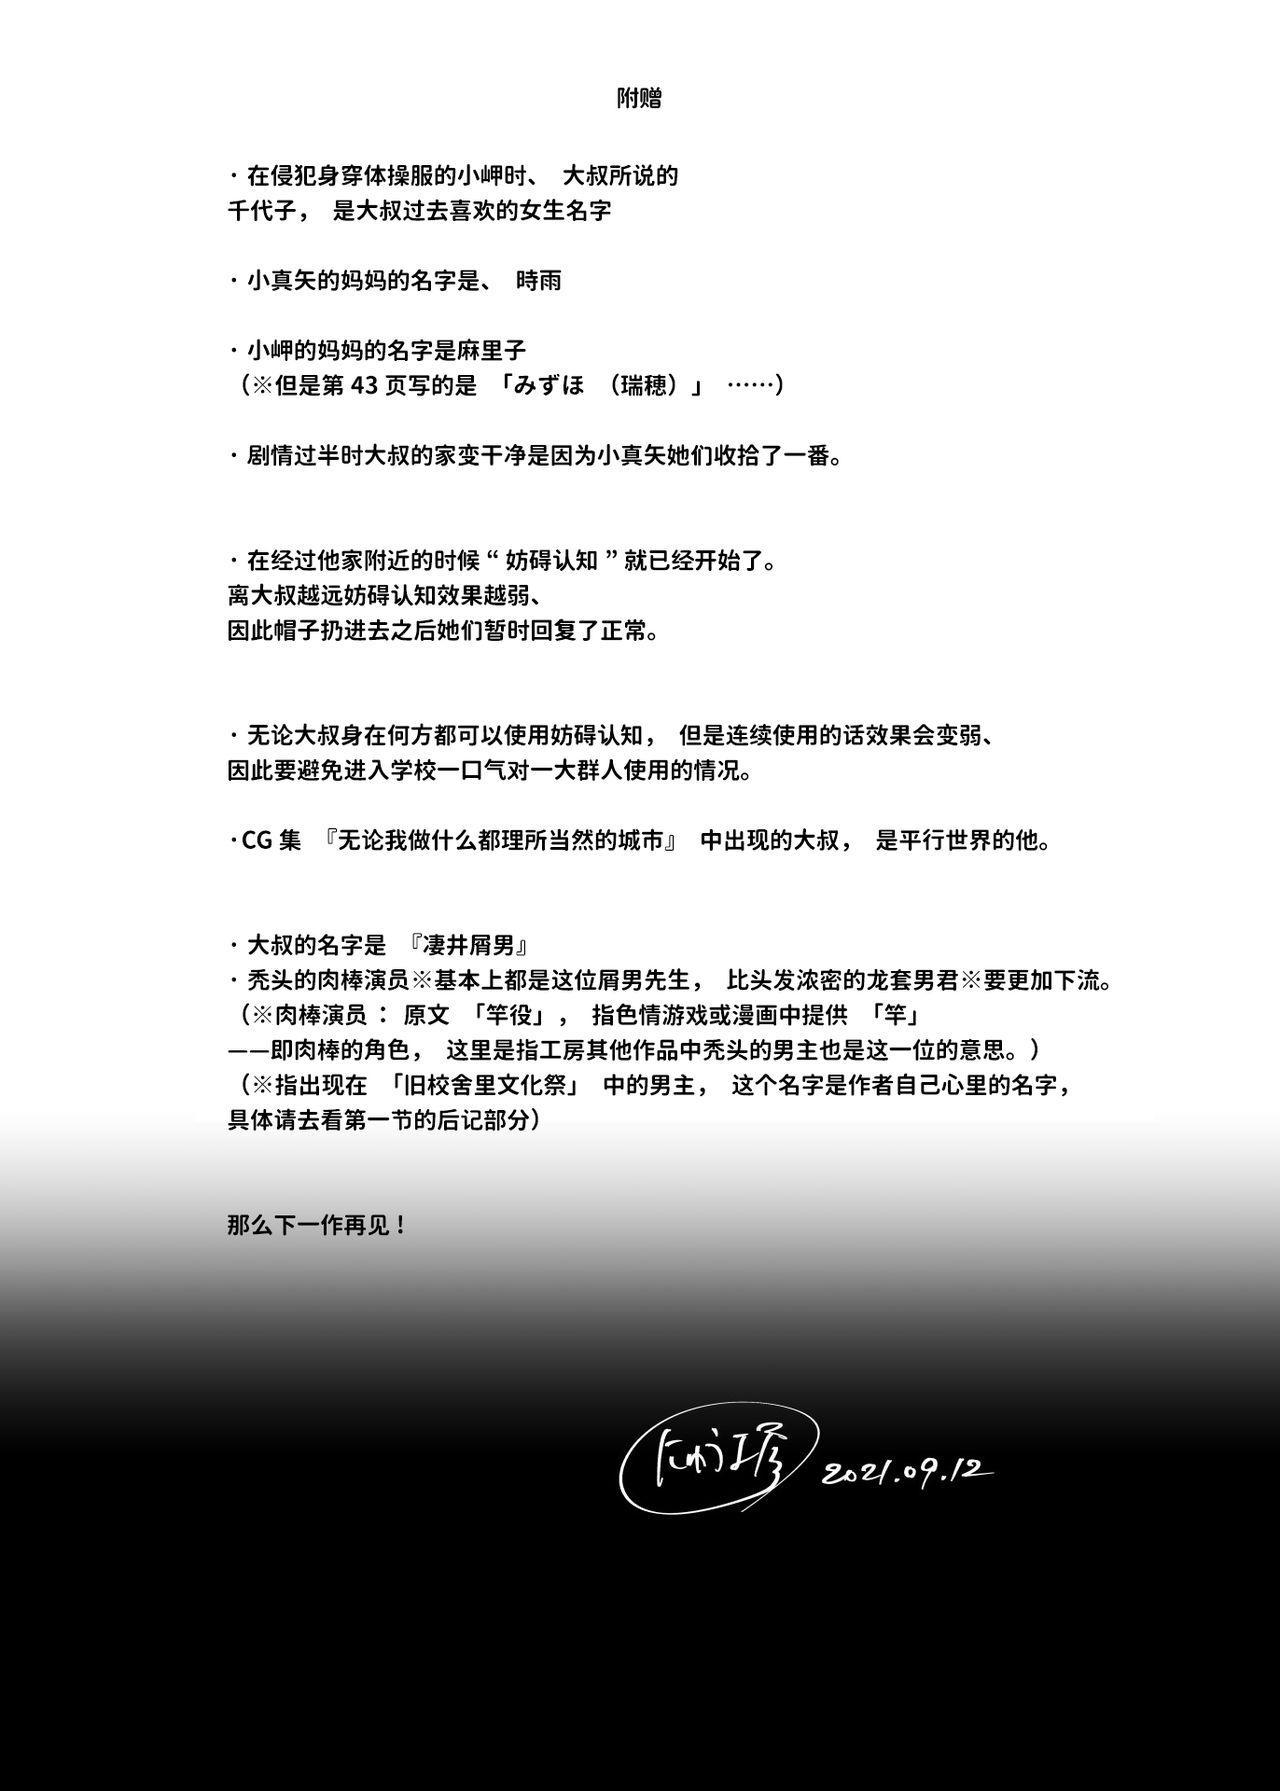 [Nyuu Koubou (Nyuu)] Ninshiki Sogai Oji-san ~Dogeza de Ecchi o Onegai suru Shoujo-tachi~ [Chinese] [神官冰点汉化] [Digital] 49